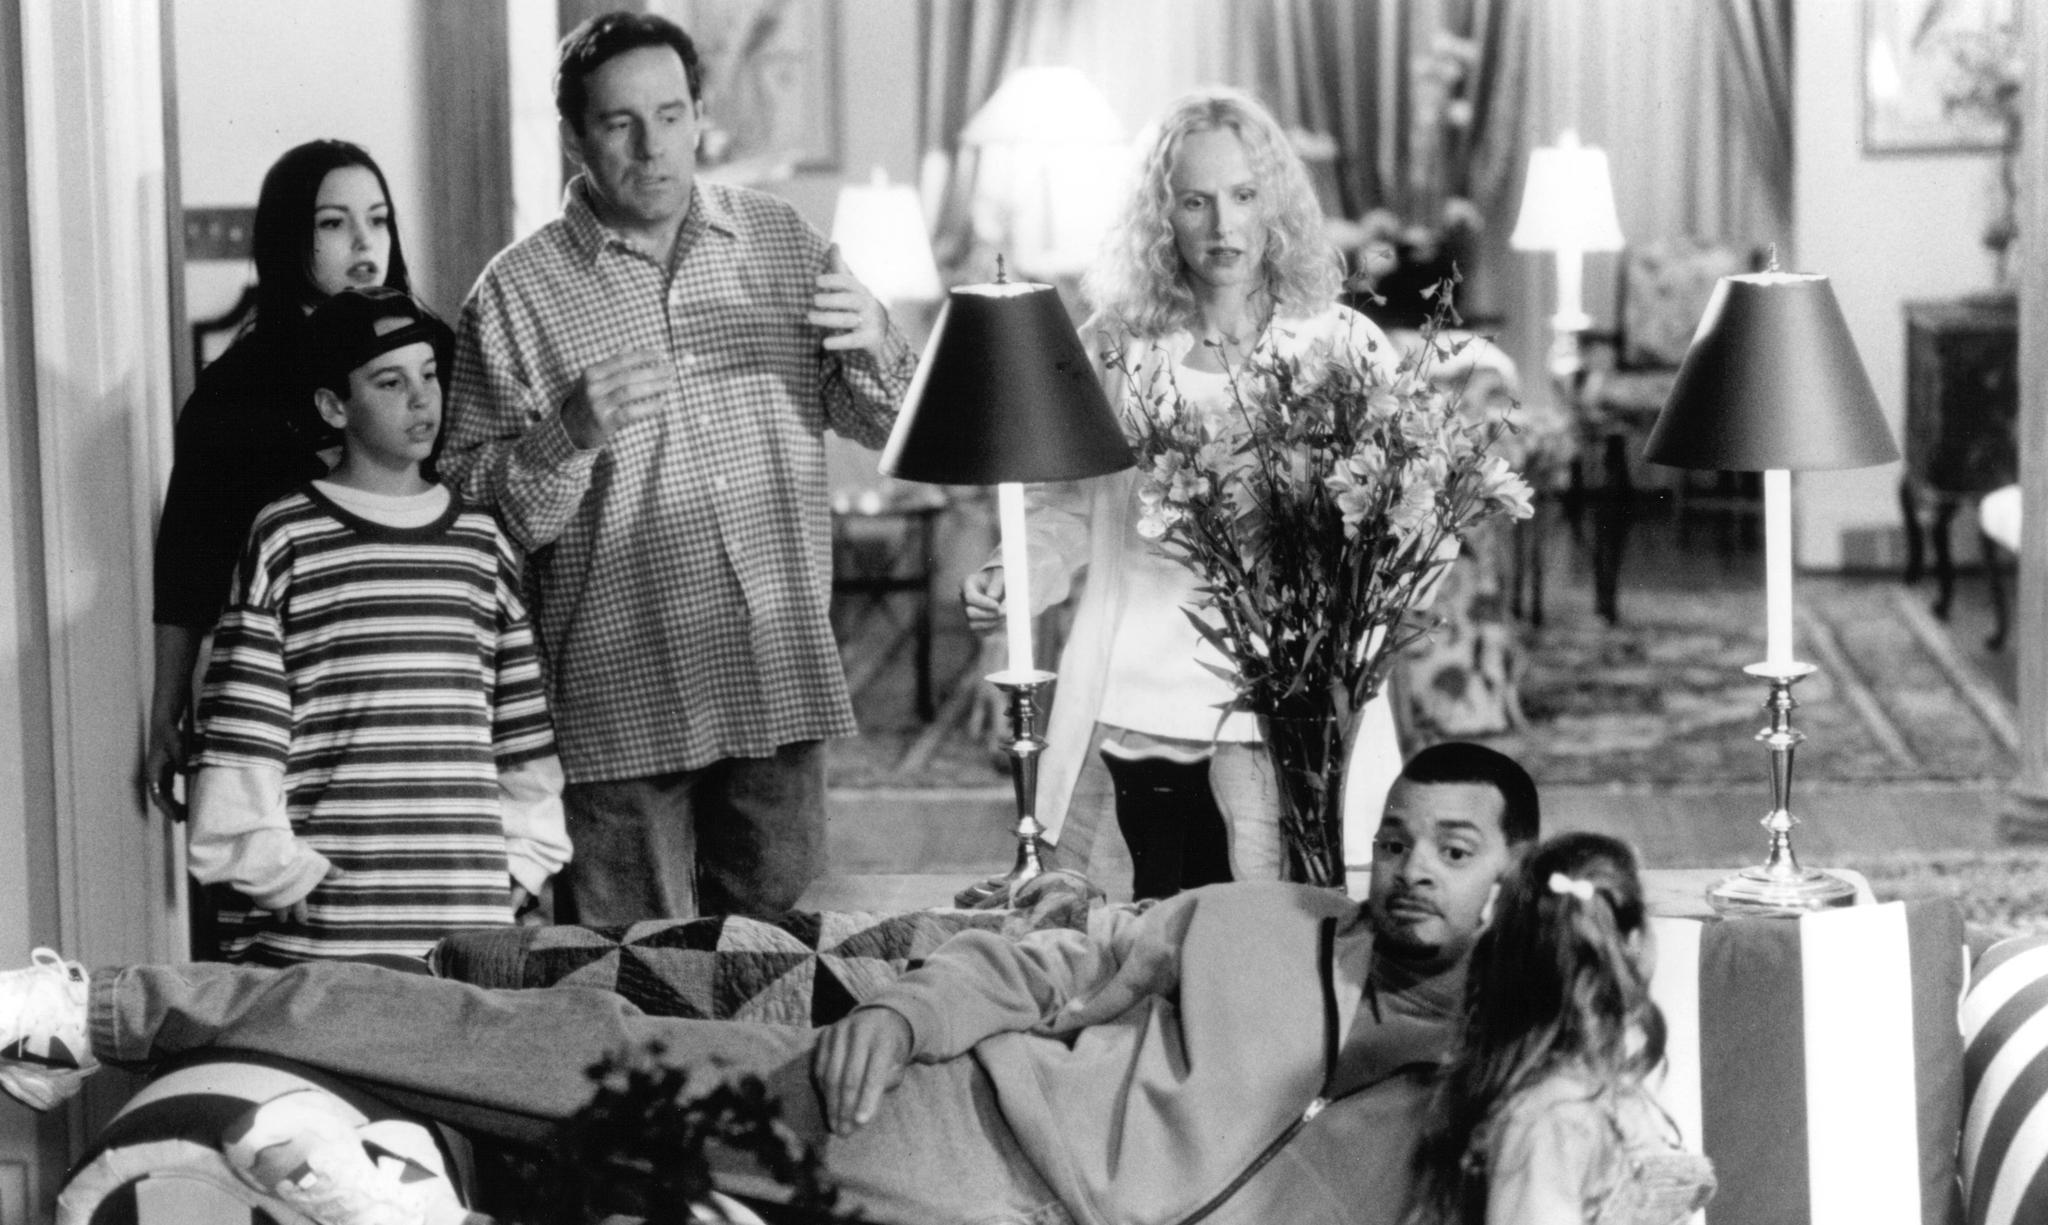 Kim Greist, Sinbad, Phil Hartman, Chauncey Leopardi, Kim Murphy, and Talia Seider in Houseguest (1995)